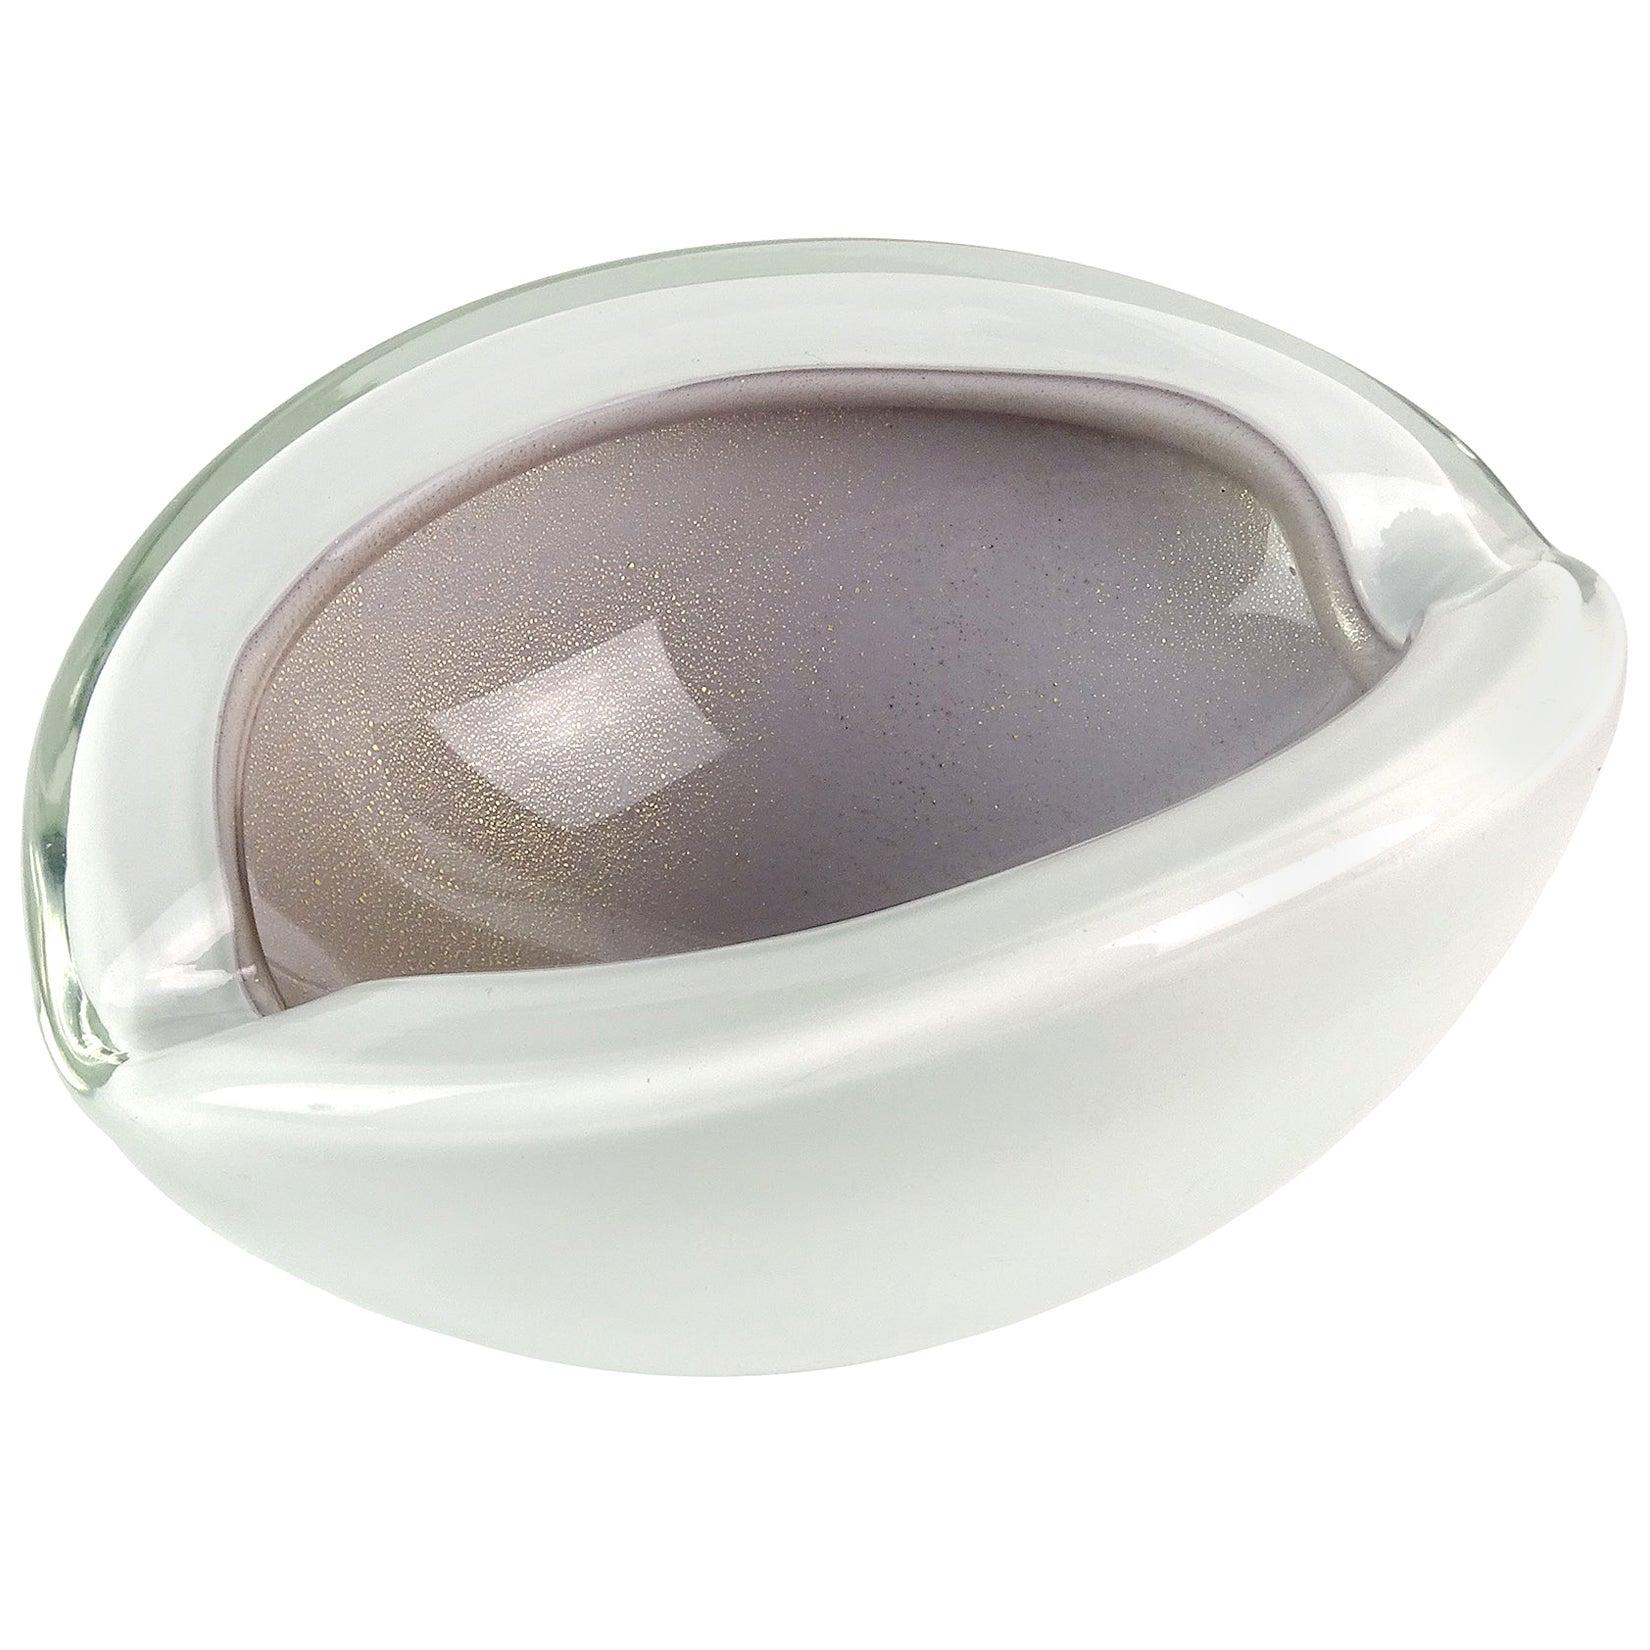 Alfredo Barbini Murano Purple Gold Flecks Italian Art Glass Midcentury Bowl